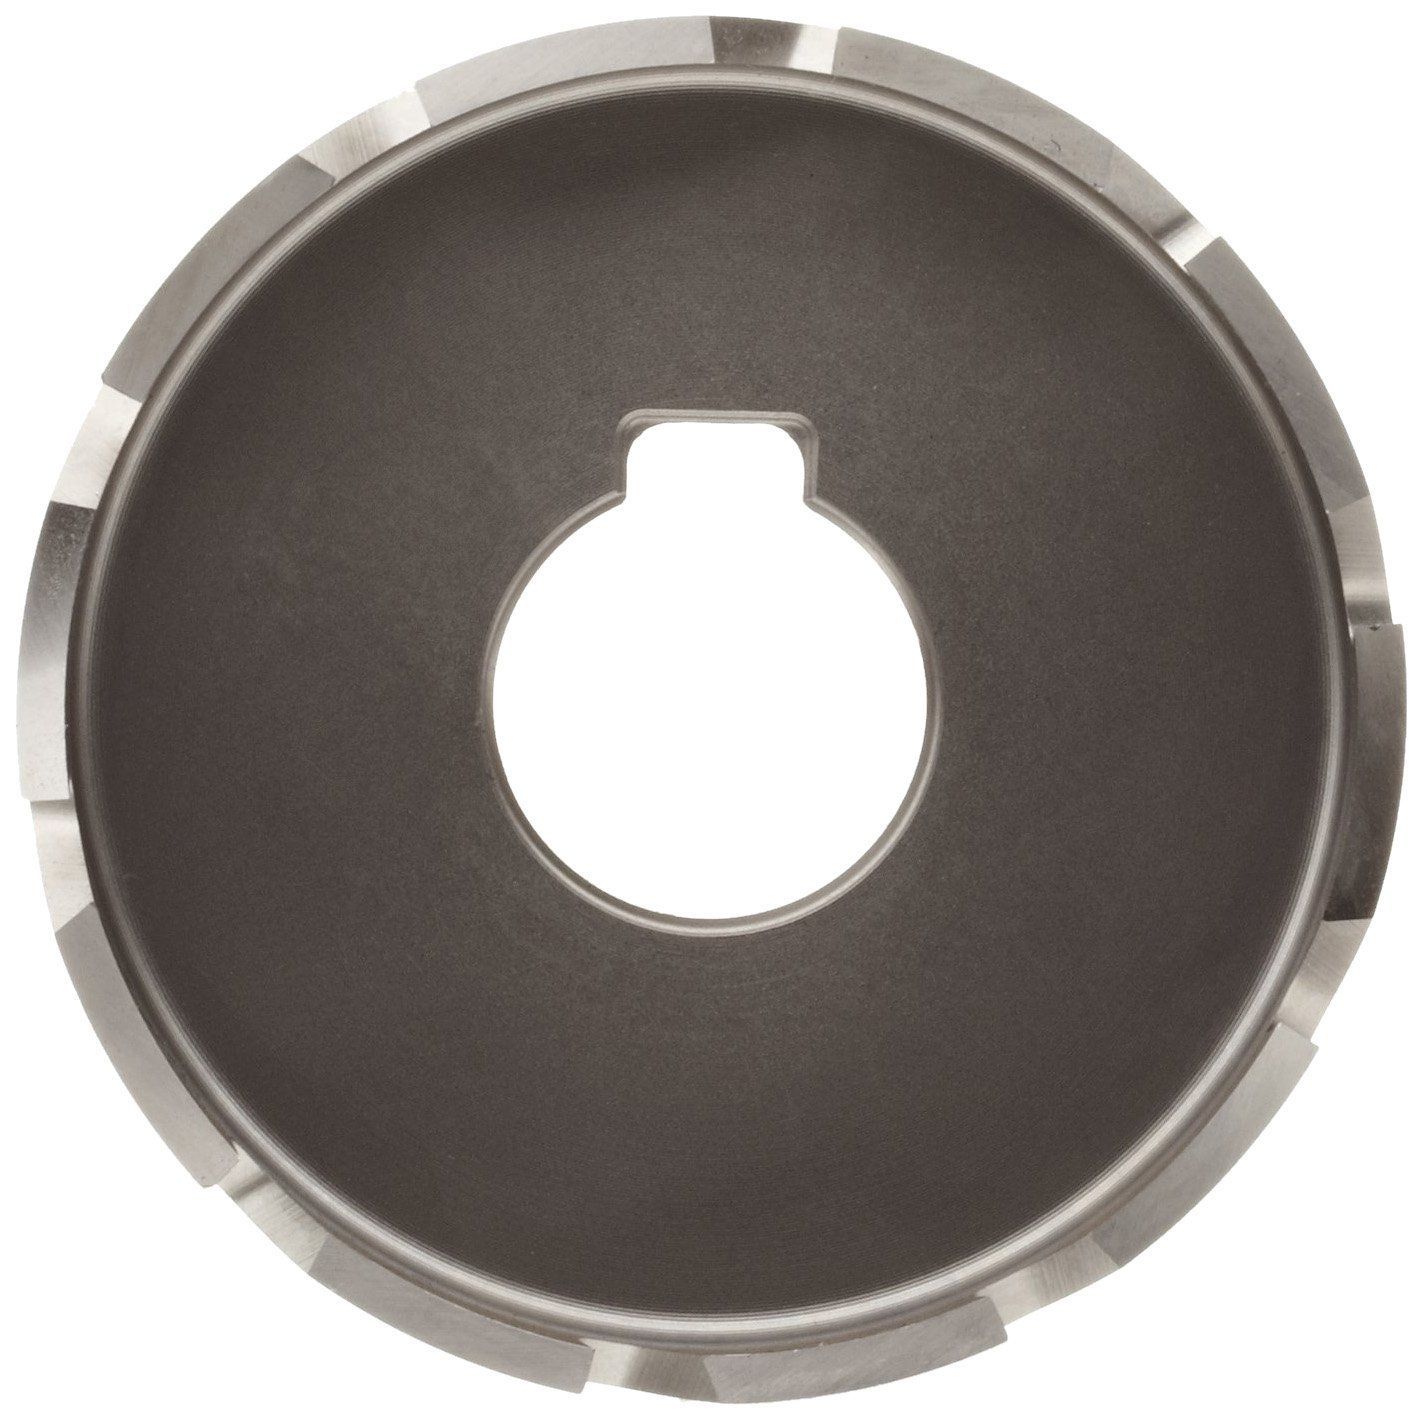 Jancy Slugger High Speed Steel Sheet Metal Cutter Uncoated Bright Finish Key Driven Shank 1 4 Depth 2 Steel Sheet Metal Sheet Metal Cutter Metal Cutter